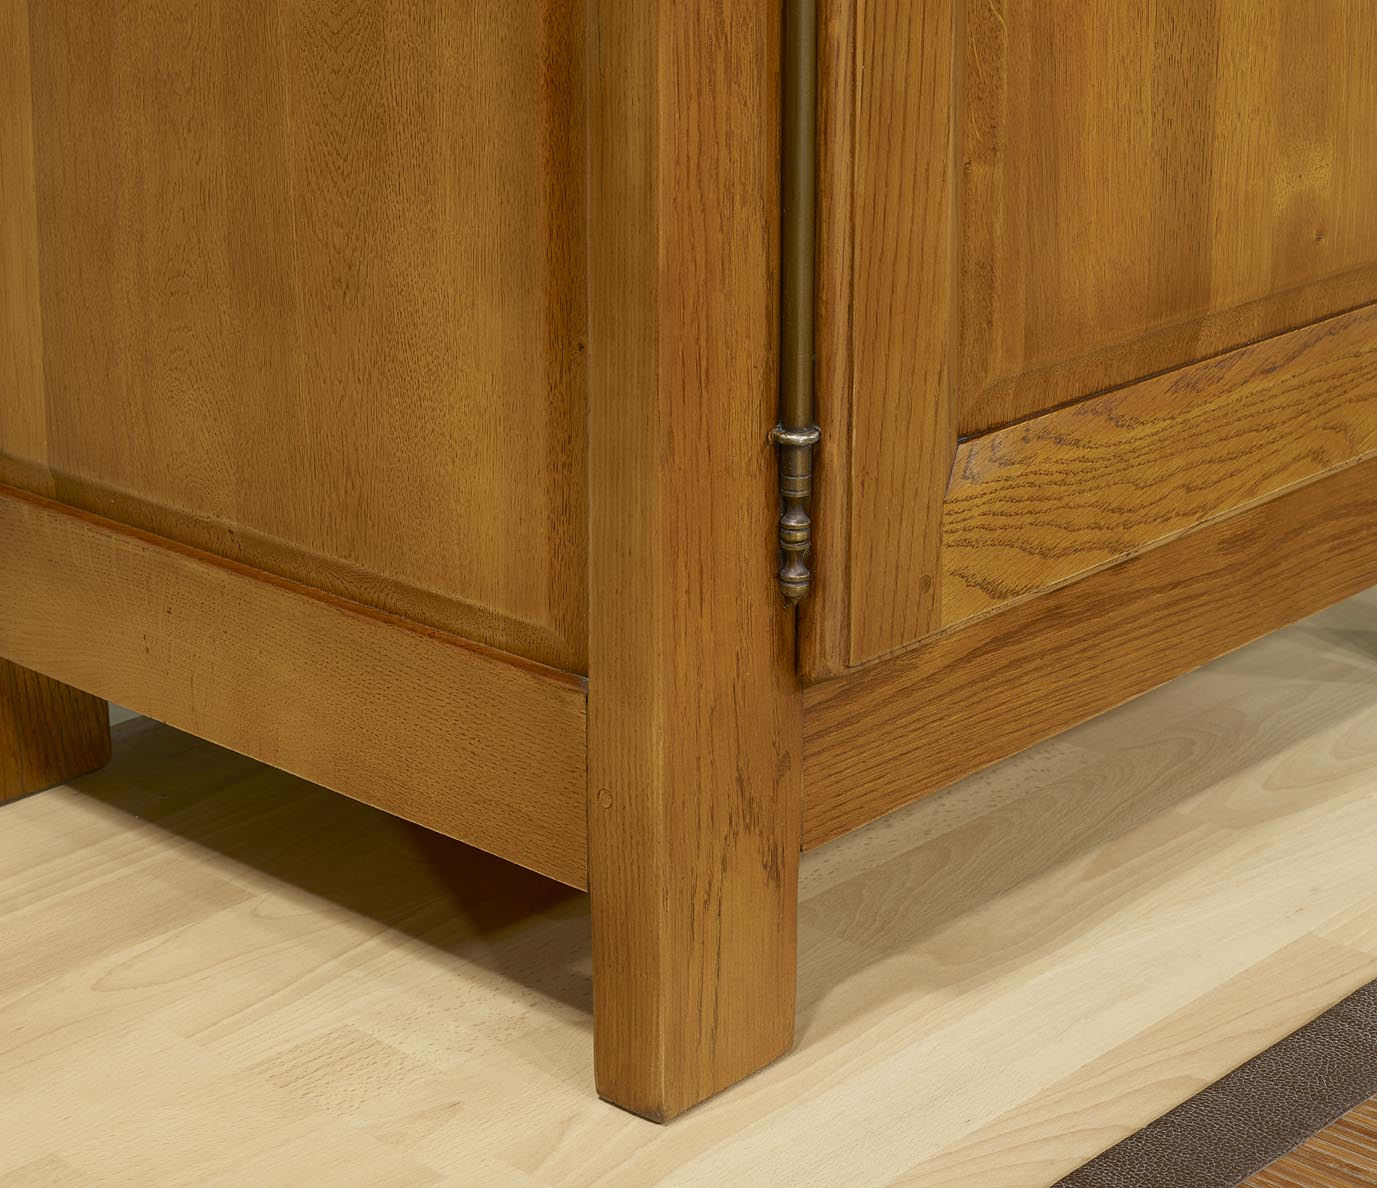 Mueble 1 puerta 1 caj n hecho de roble macizo estilo for Puerta de roble macizo castorama